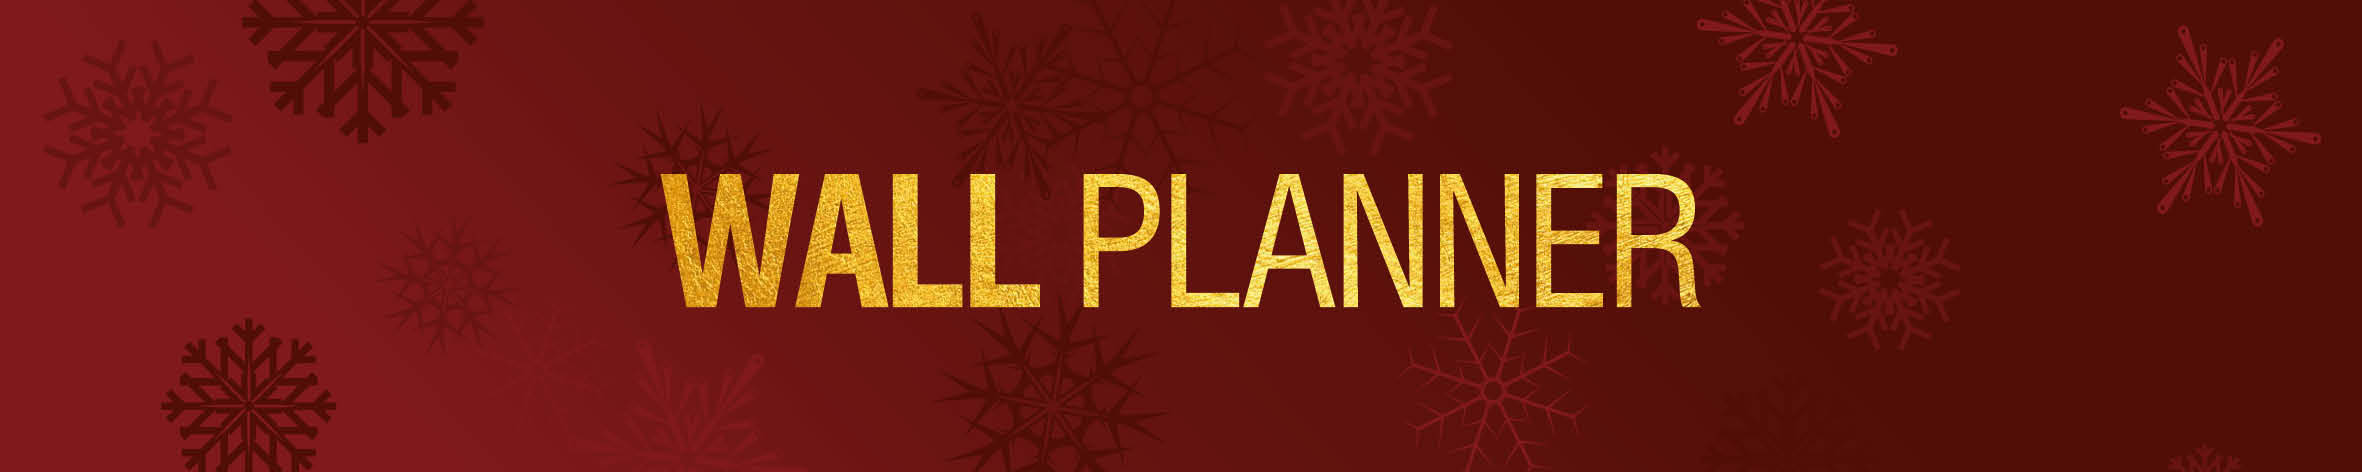 Christmas Wallplanner Banner 19